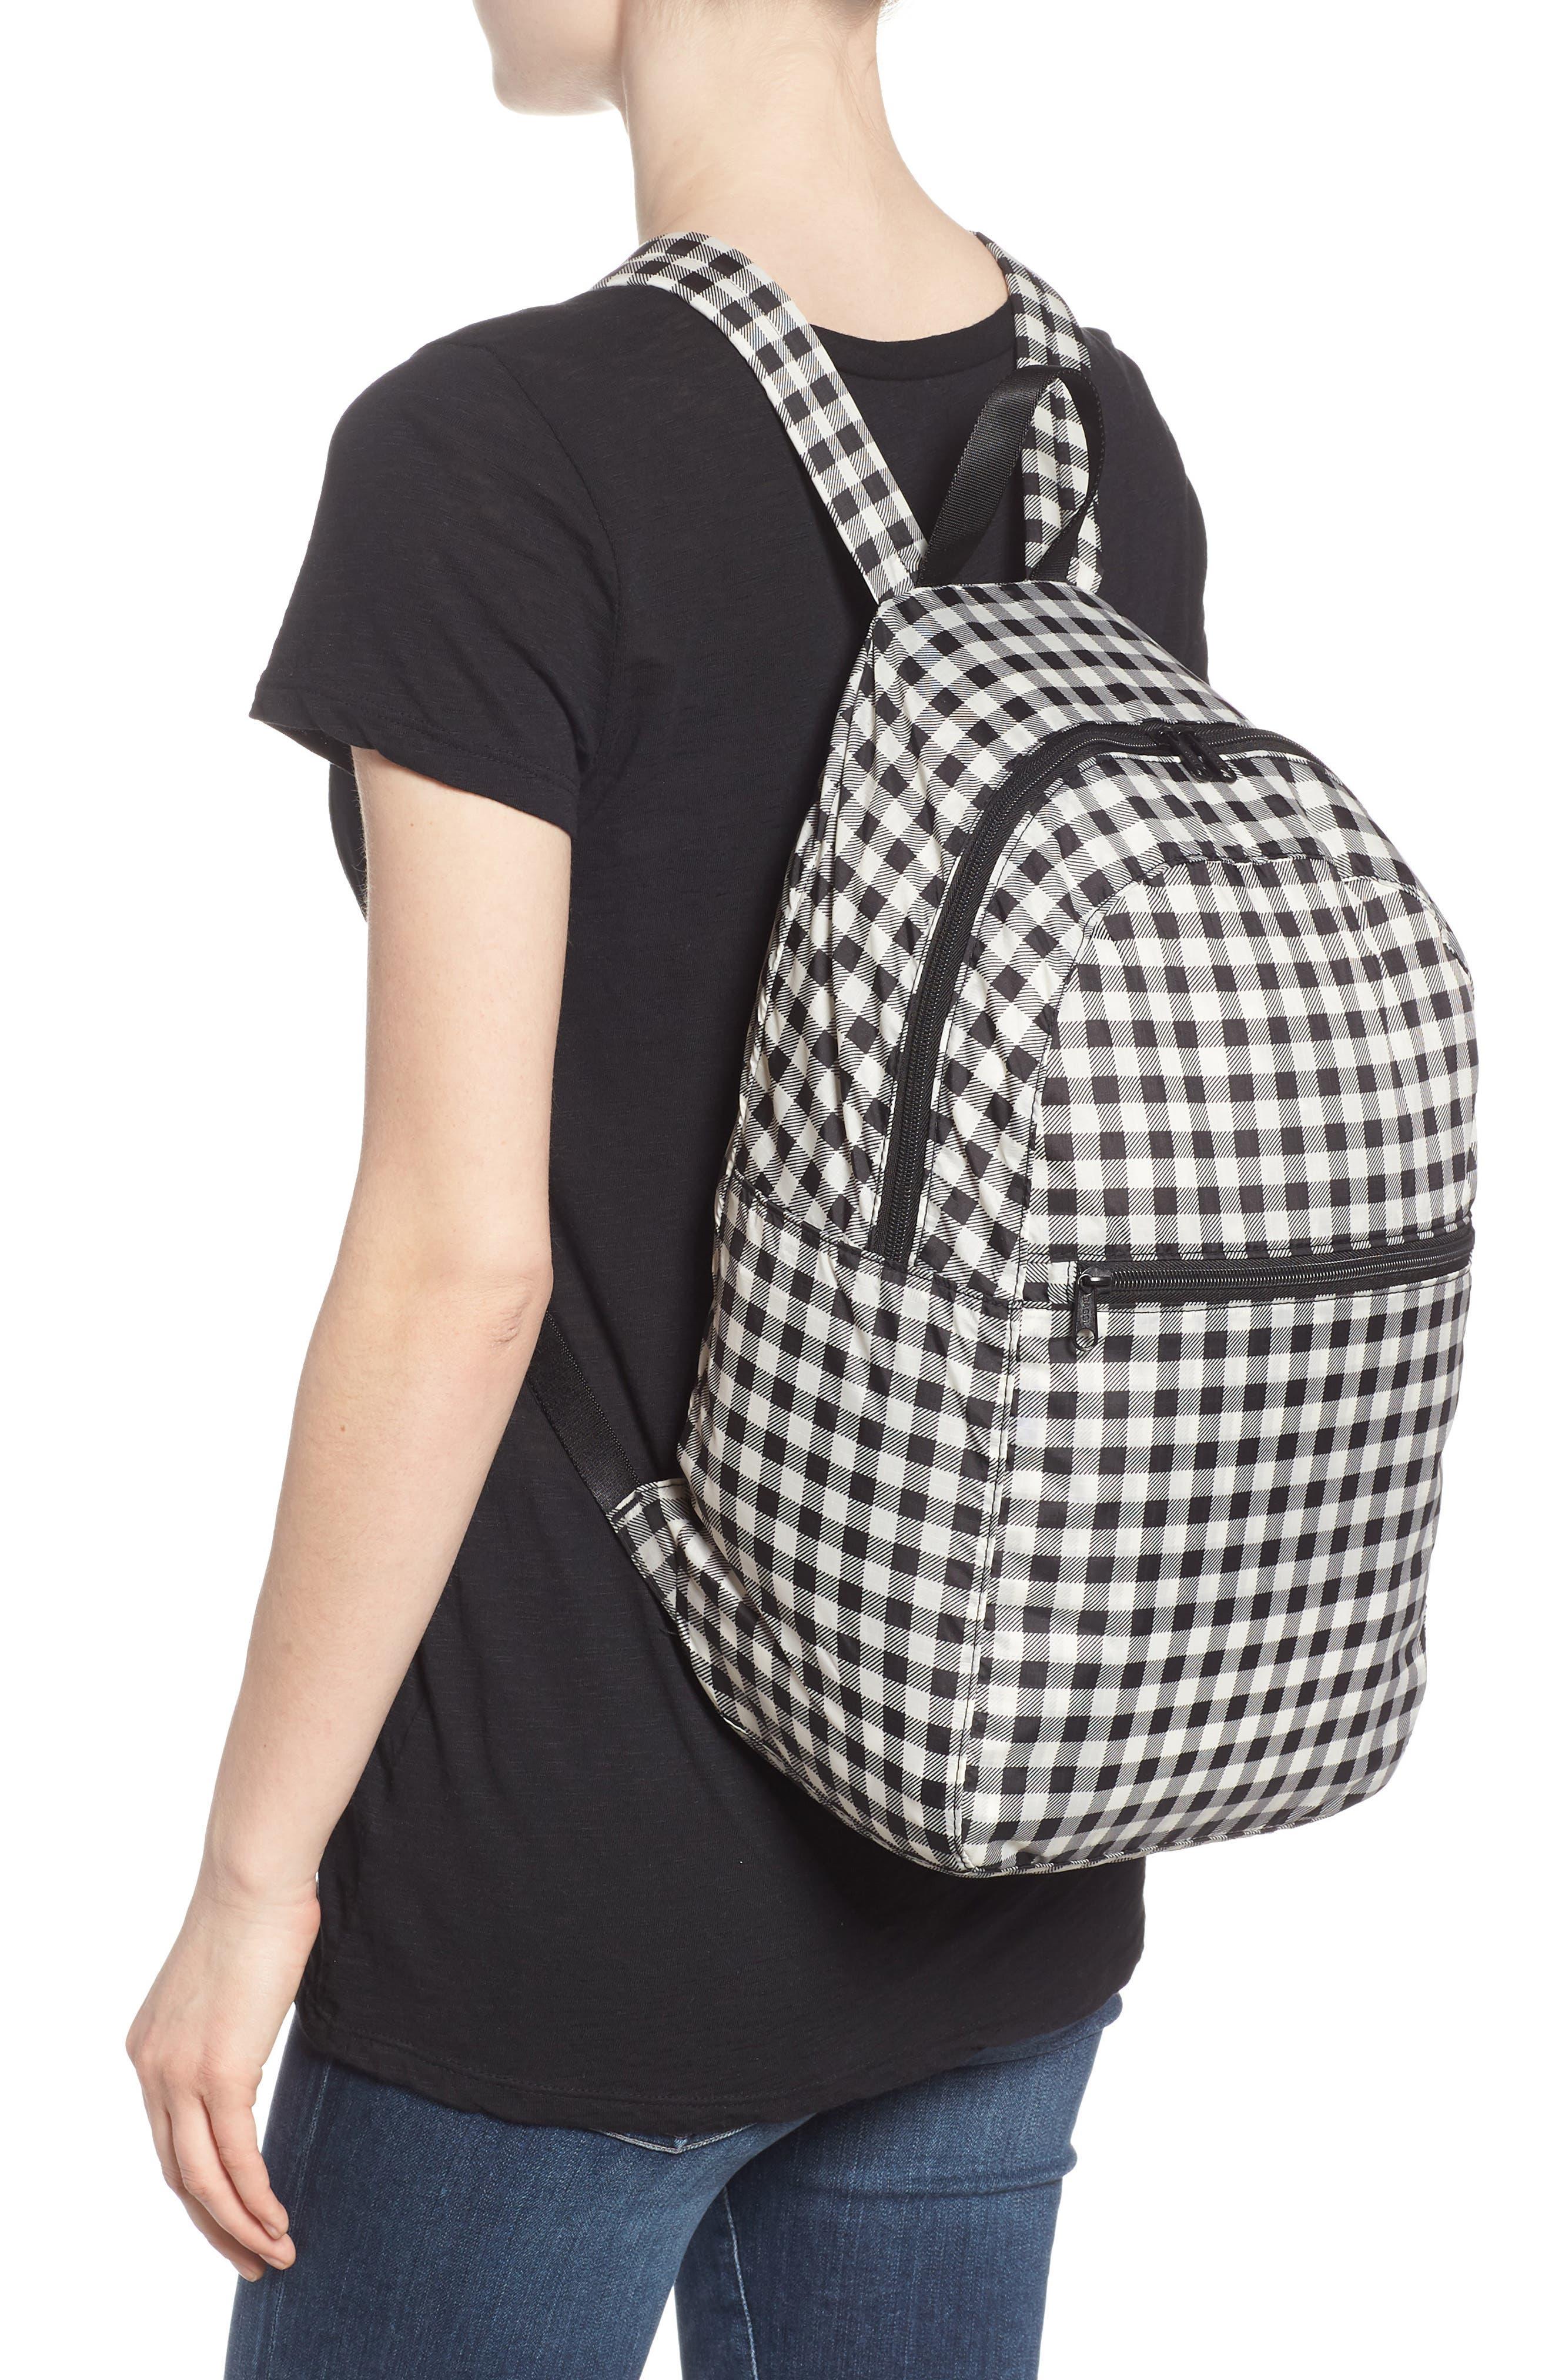 Ripstop Nylon Backpack,                             Alternate thumbnail 5, color,